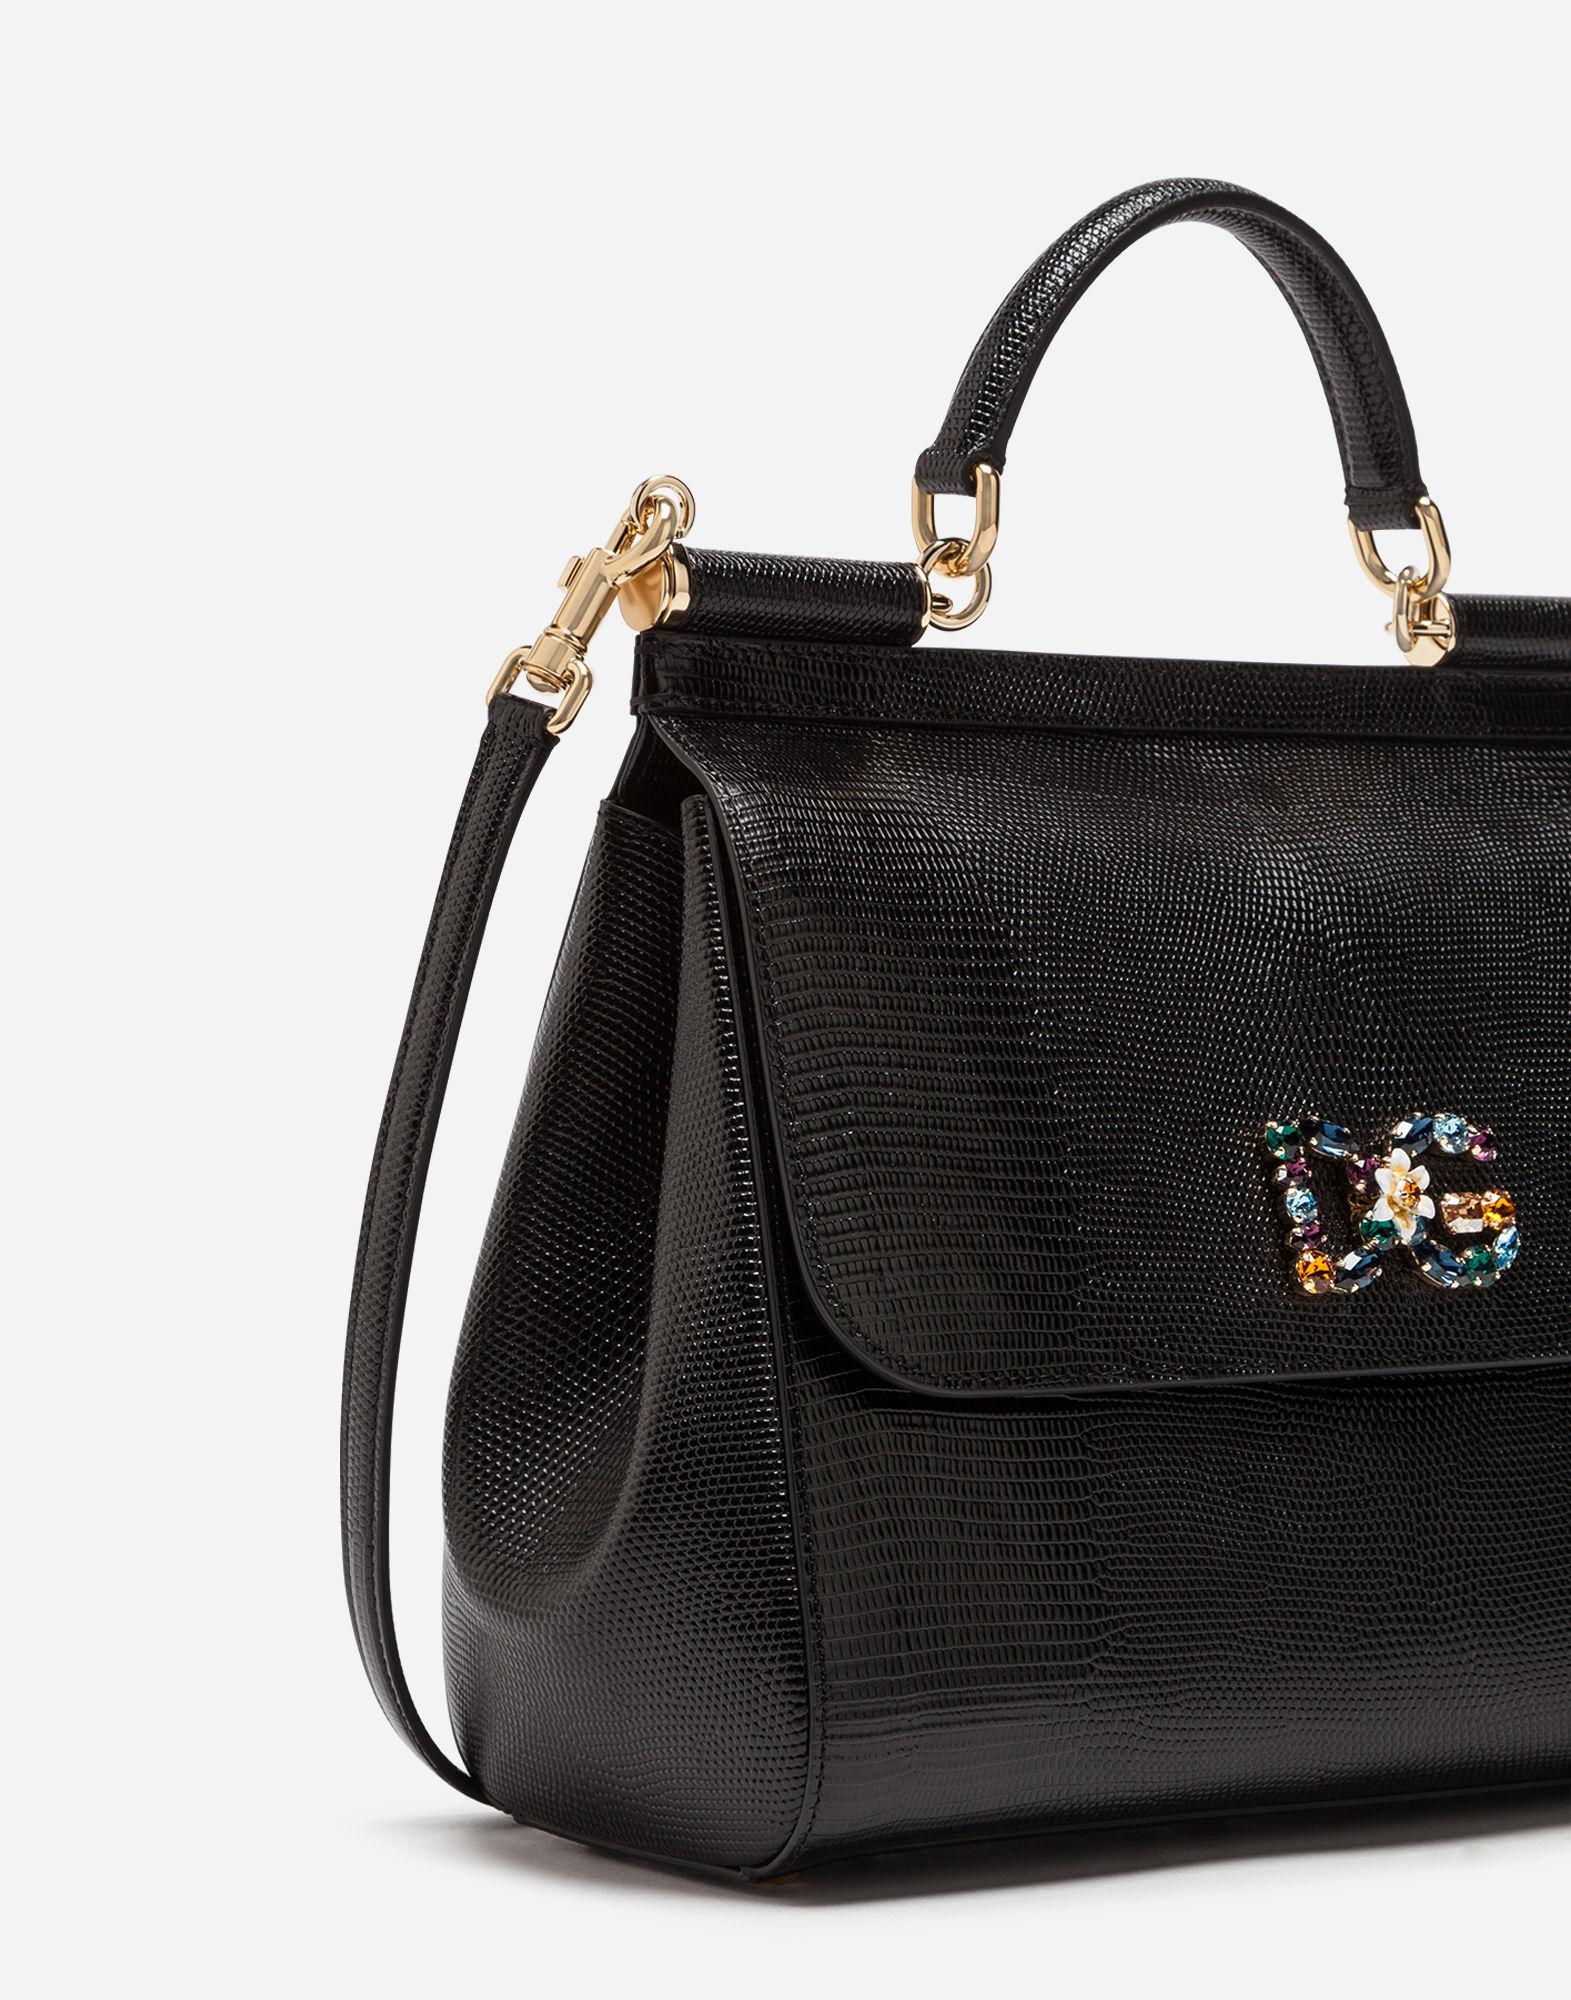 Lyst - Dolce   Gabbana Sicily Handbag In Iguana Print Calfskin And Crystal  Dg Logo Patch in Black - Save 30% ed6755a12cc1b